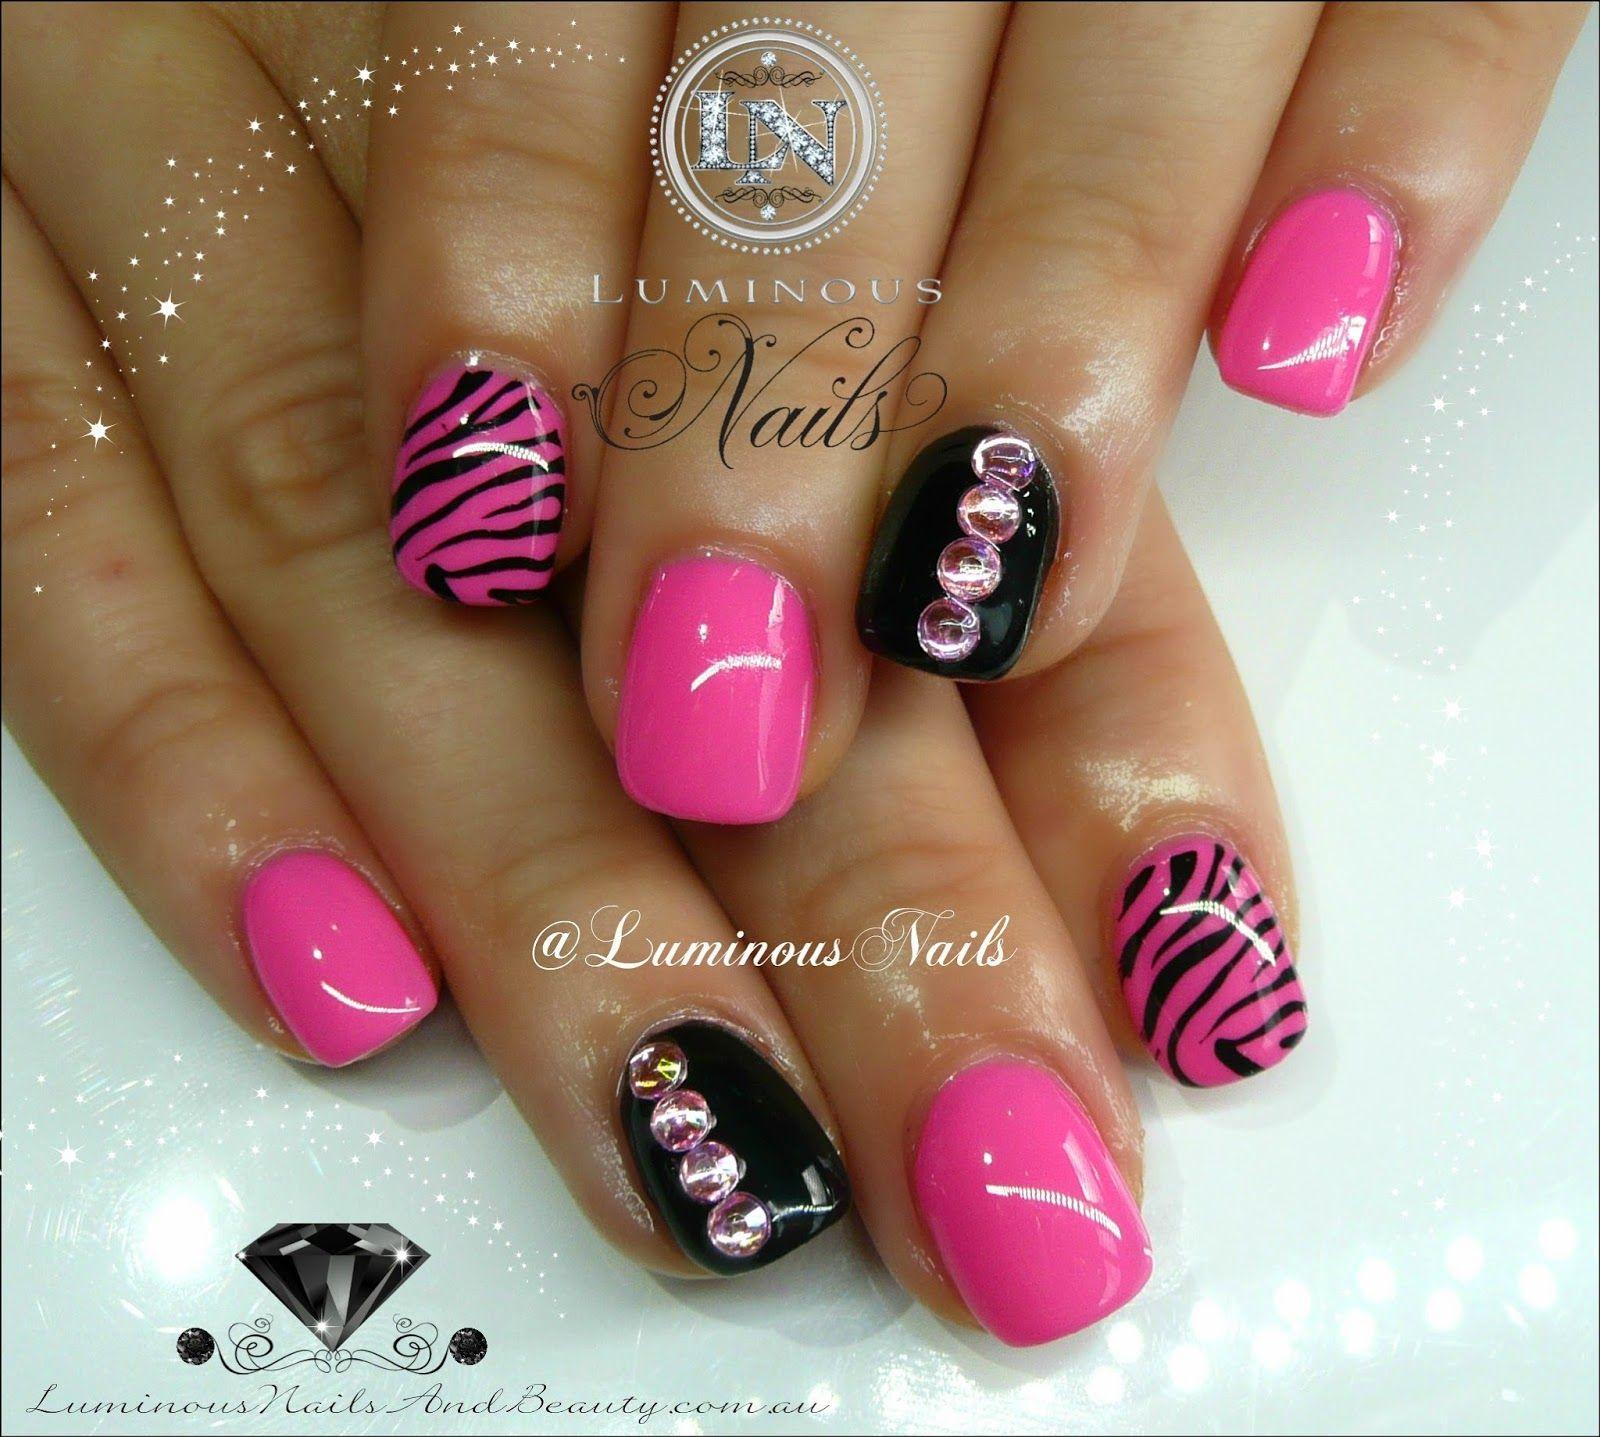 Luminous nails cute pink black nails with zebra print bling luminous nails cute pink black nails with zebra print prinsesfo Choice Image